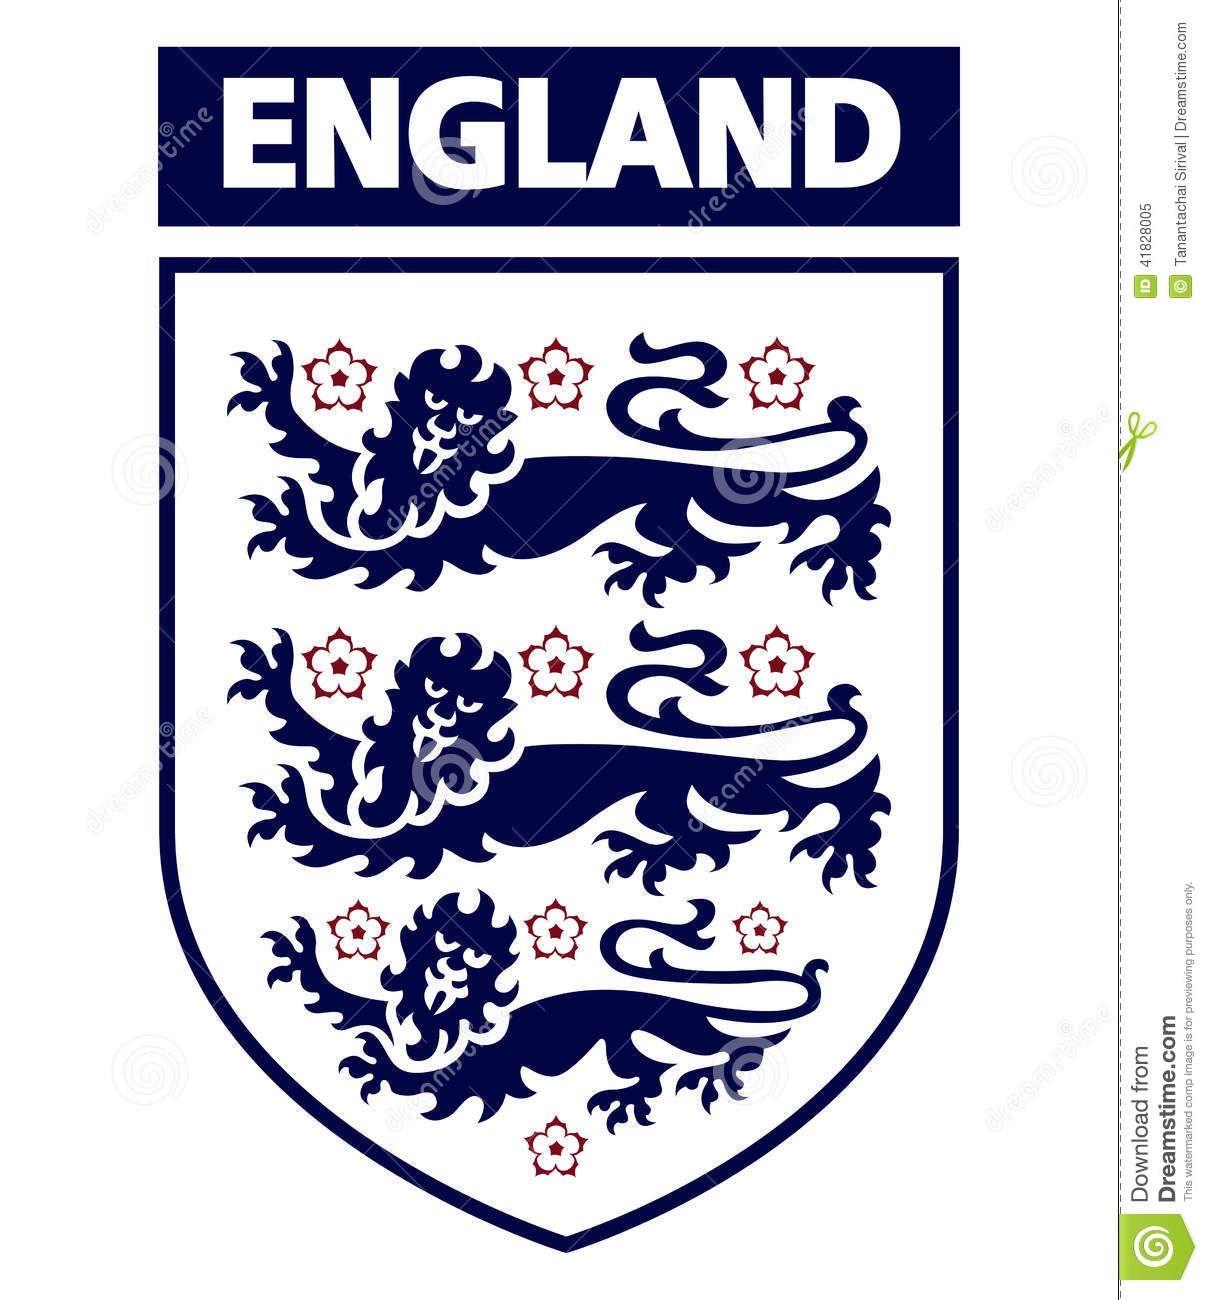 football team logos uk